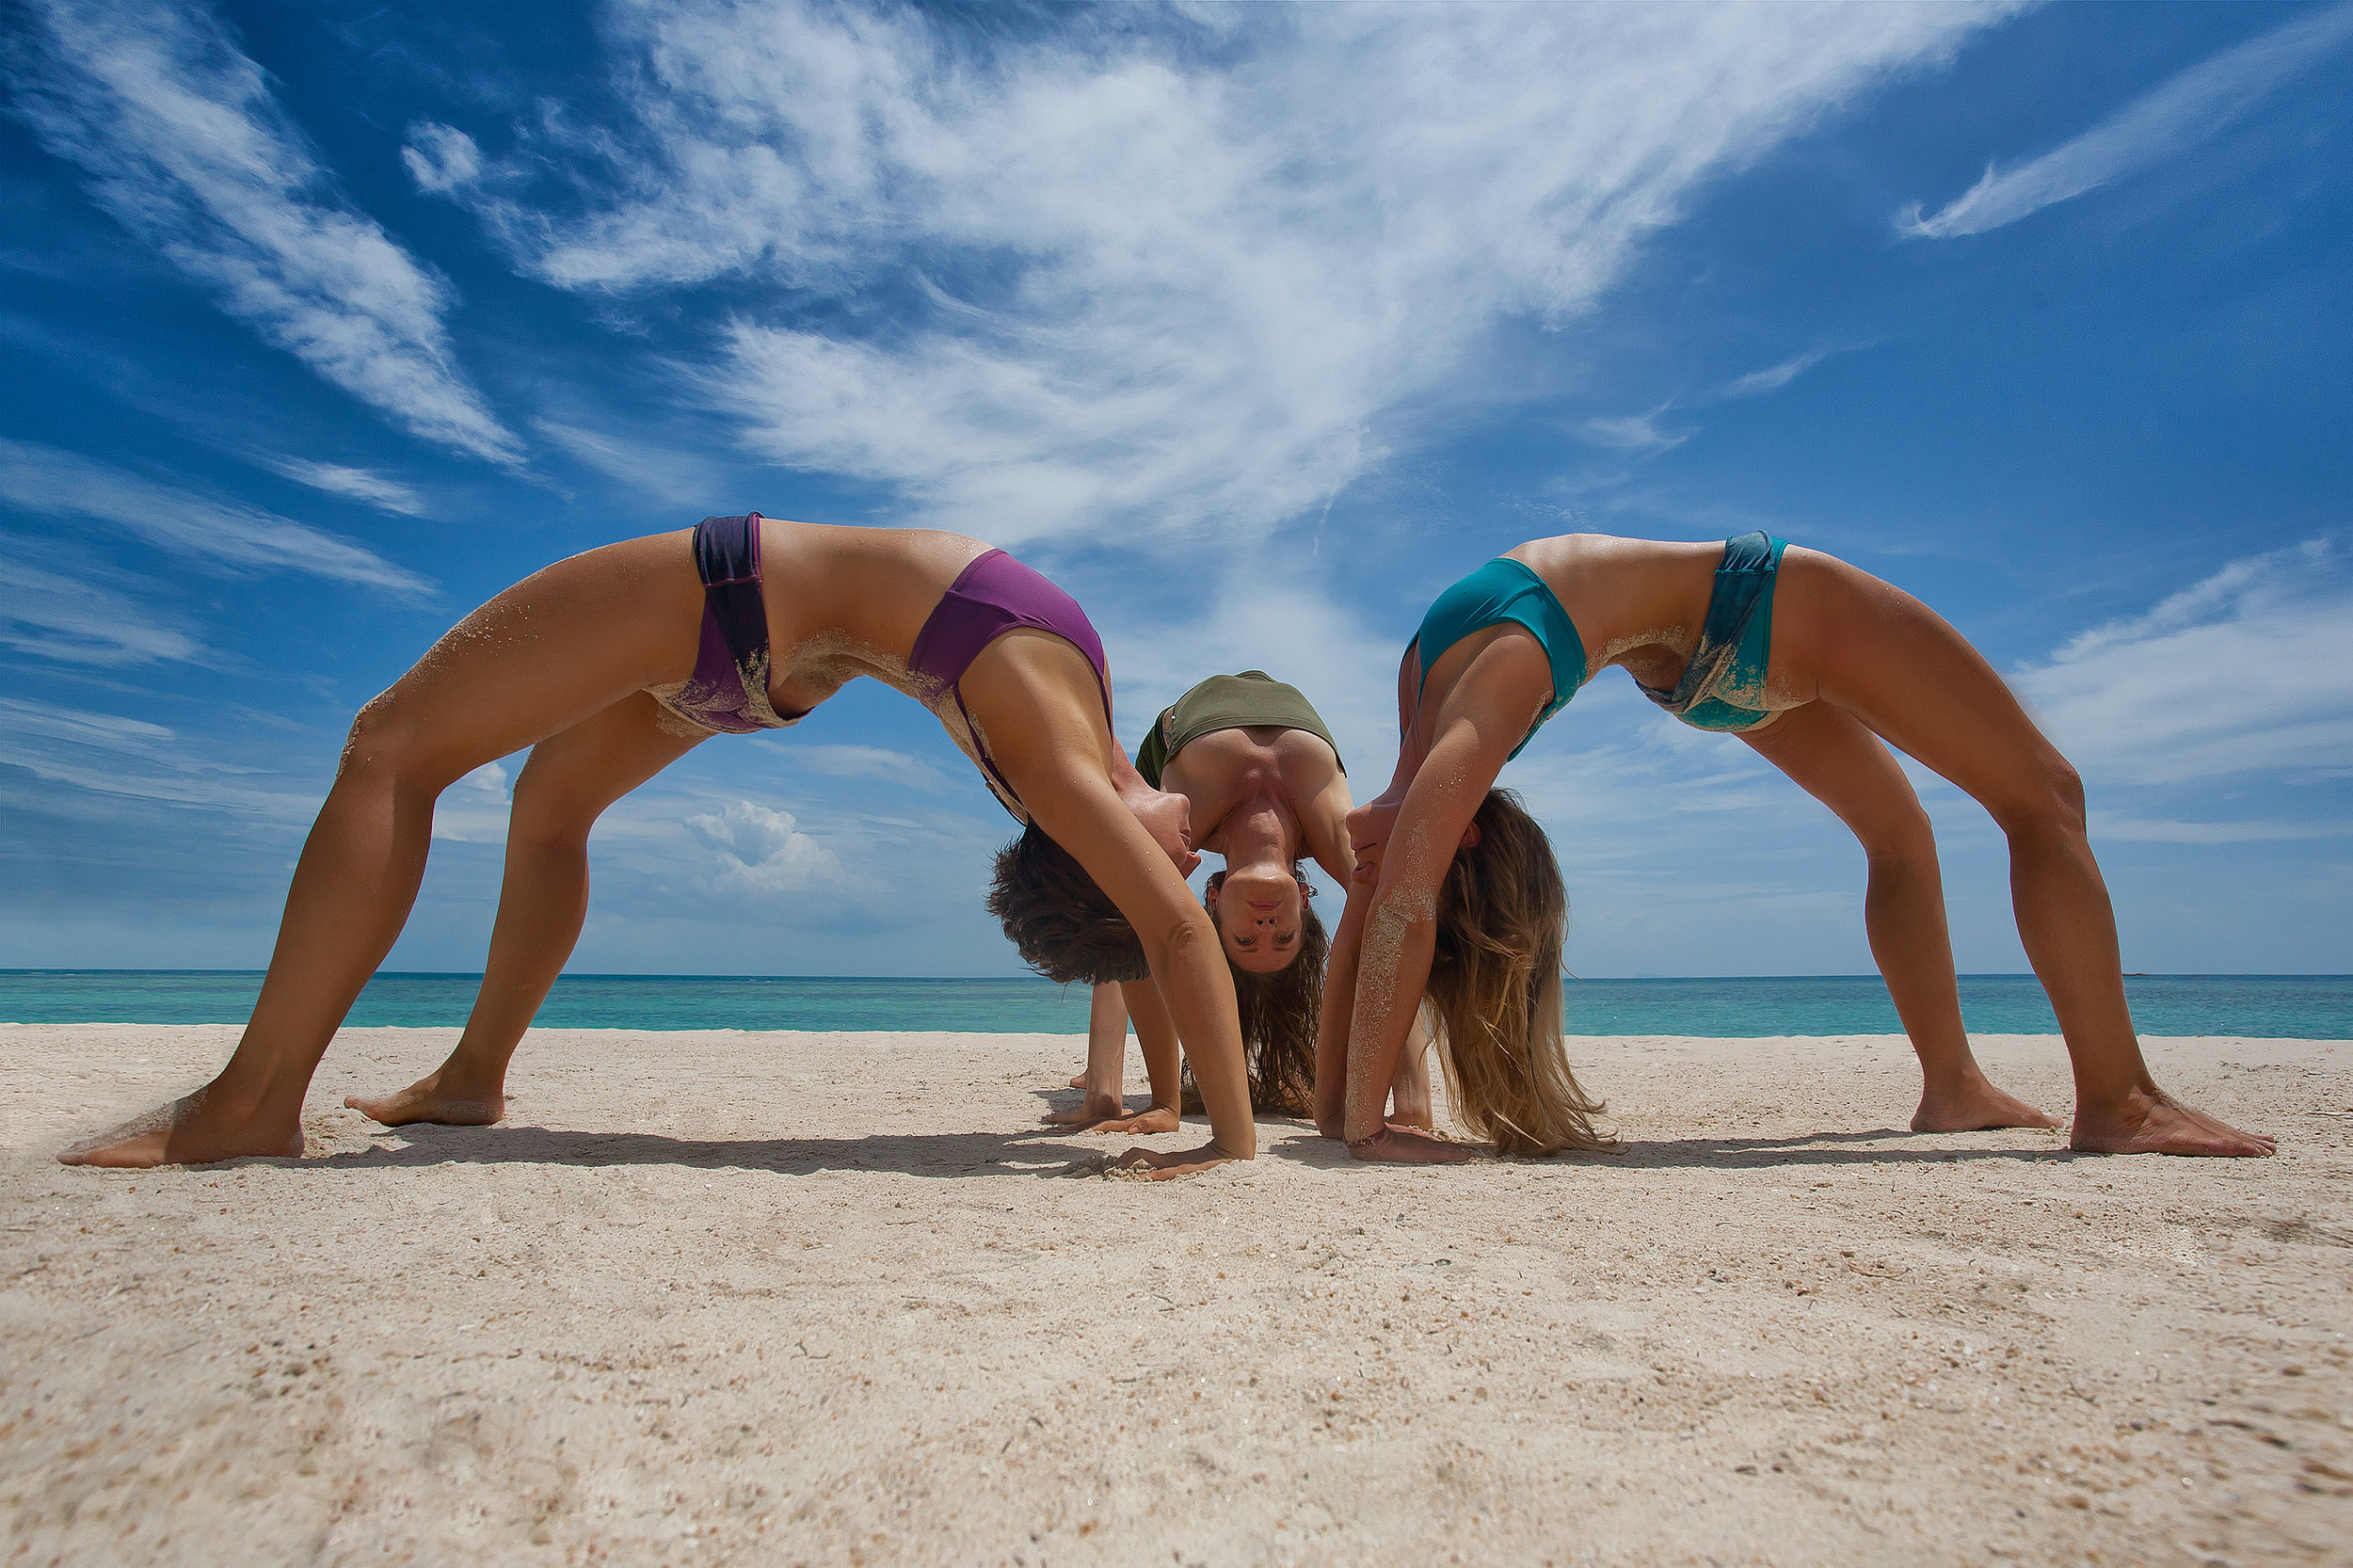 Jessica-vilches-yoga-teacher-training-200-hrs-yoga-alliance-iphm-ashtanga-vinyasa-yoga-goa-india-arambol-ubud-bali